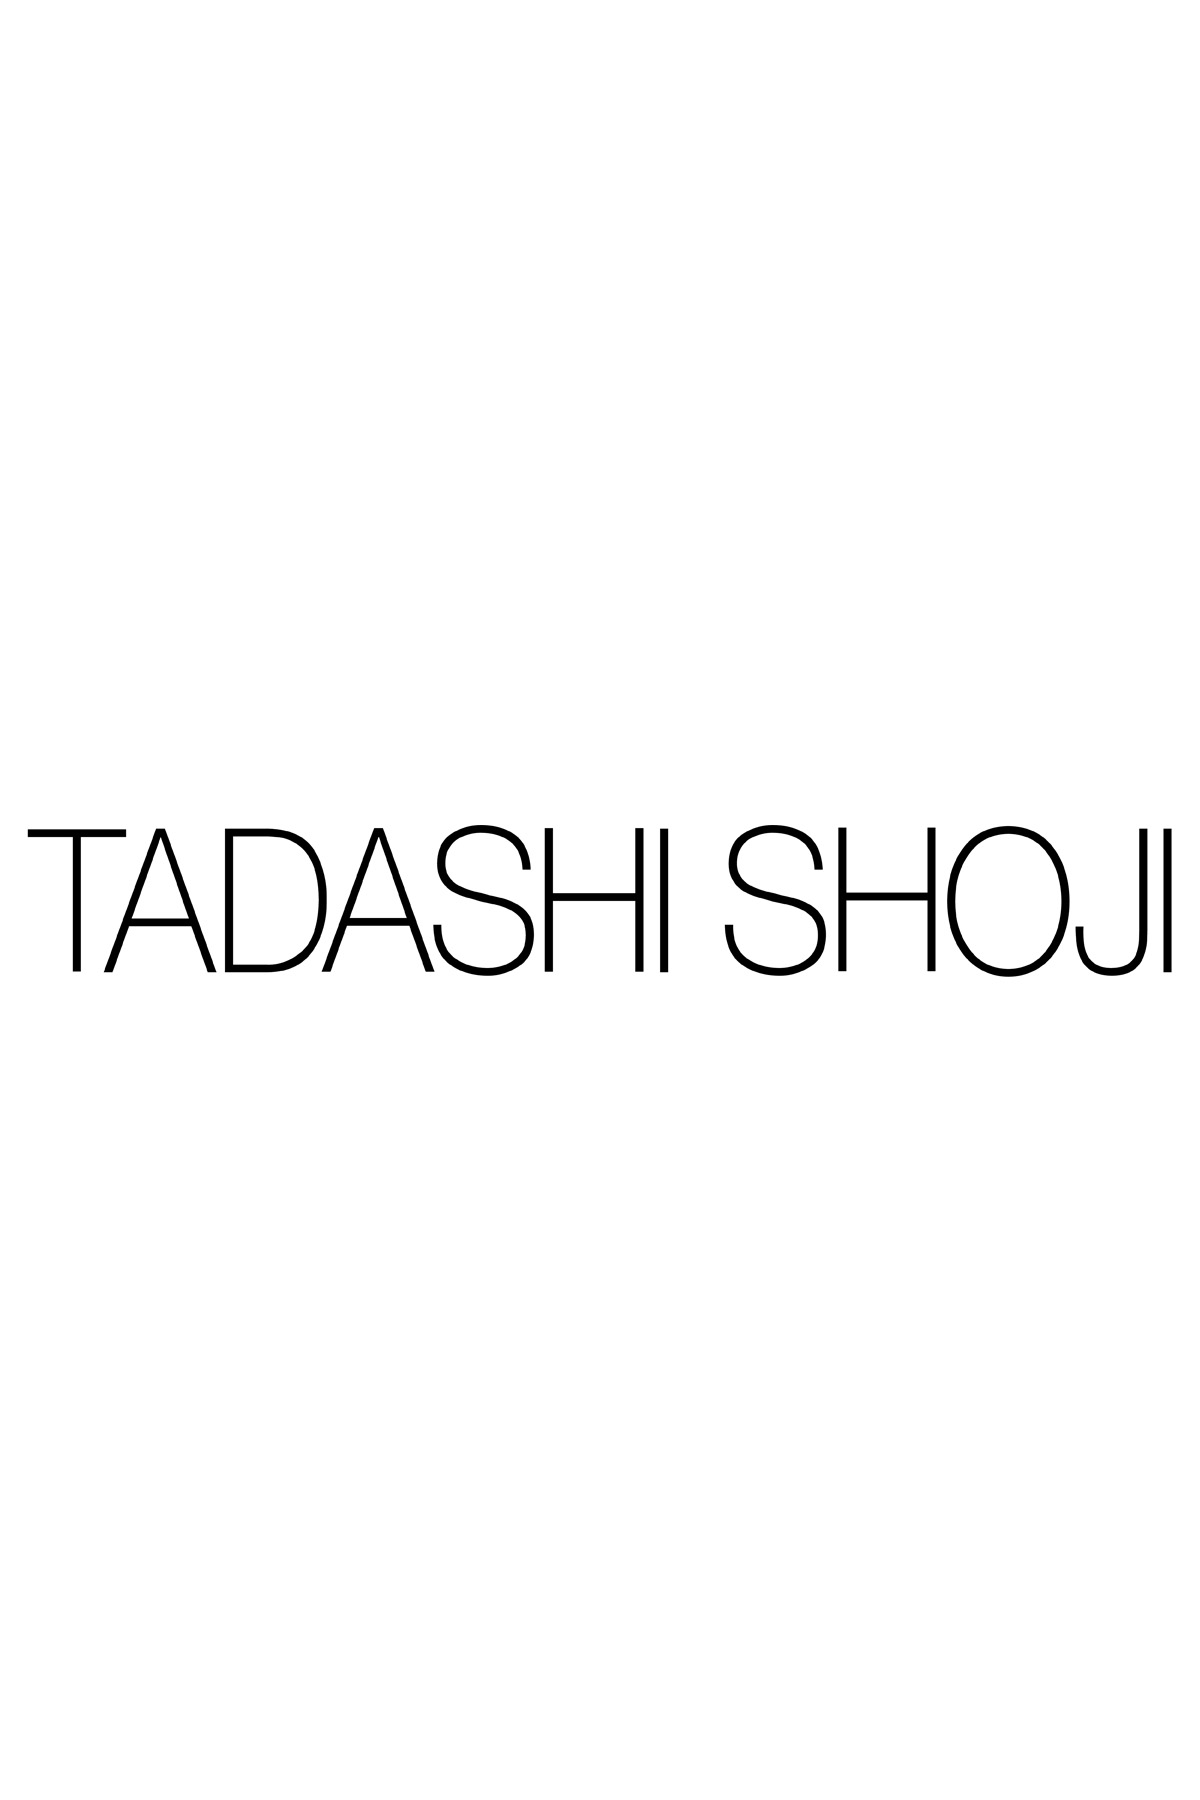 Tadashi Shoji Plus Size - Laser Cut Embroidery Draped Tulle Gown - Detail